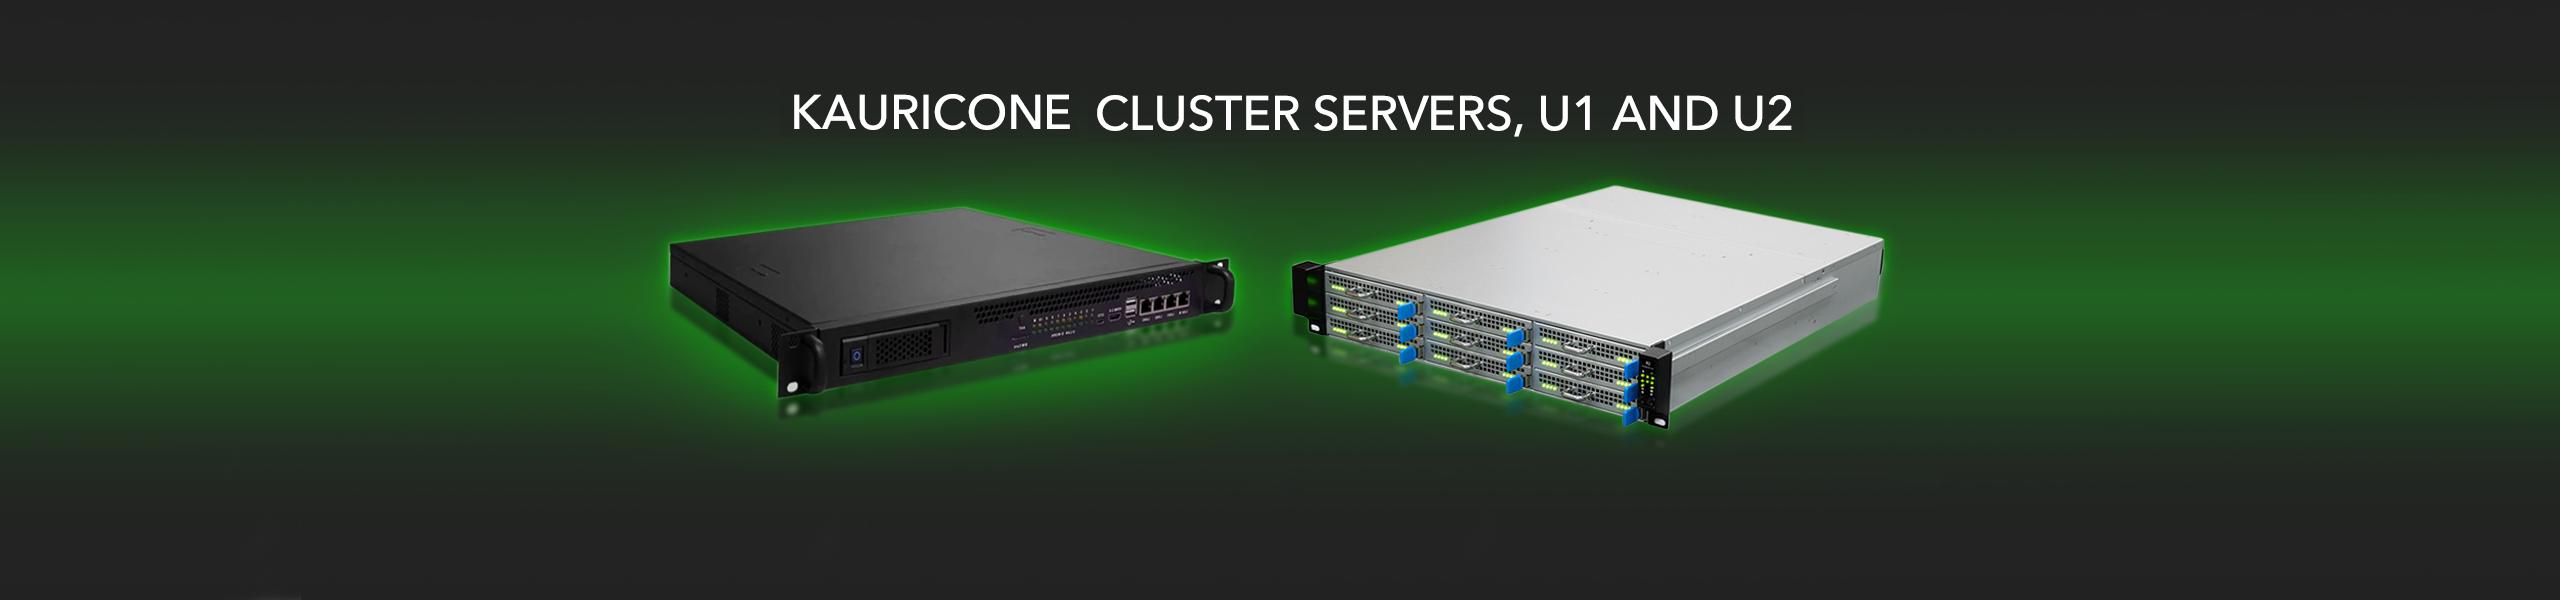 Kauricone Cluster Server U2 Order Now